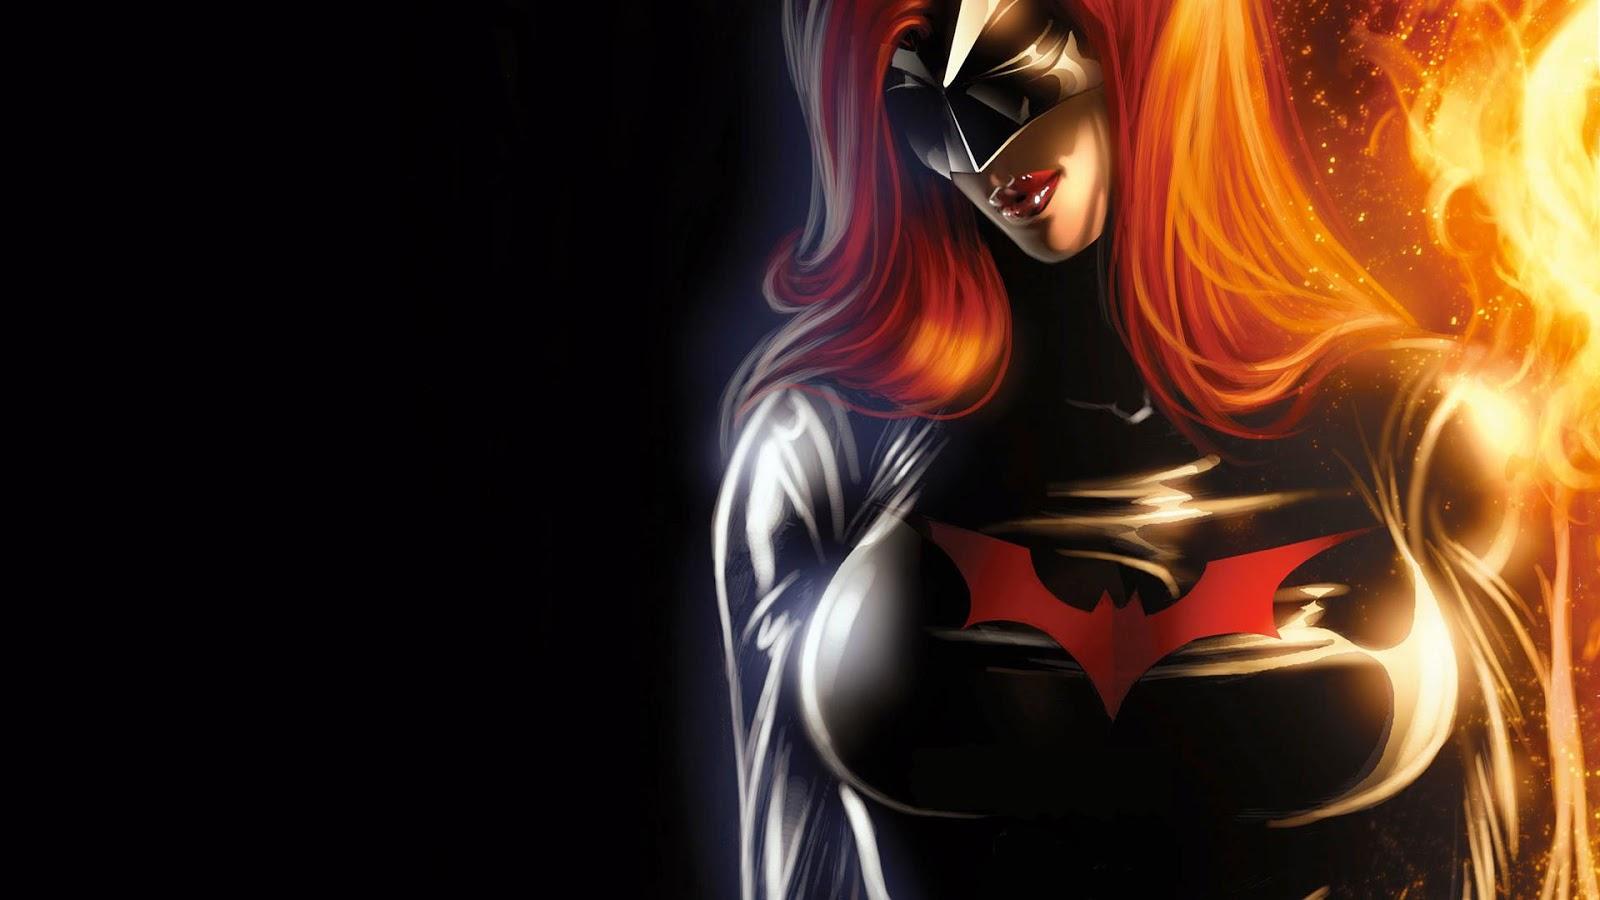 Hd wallpaper darkness - Superhero Wallpapers Hd Screenshot